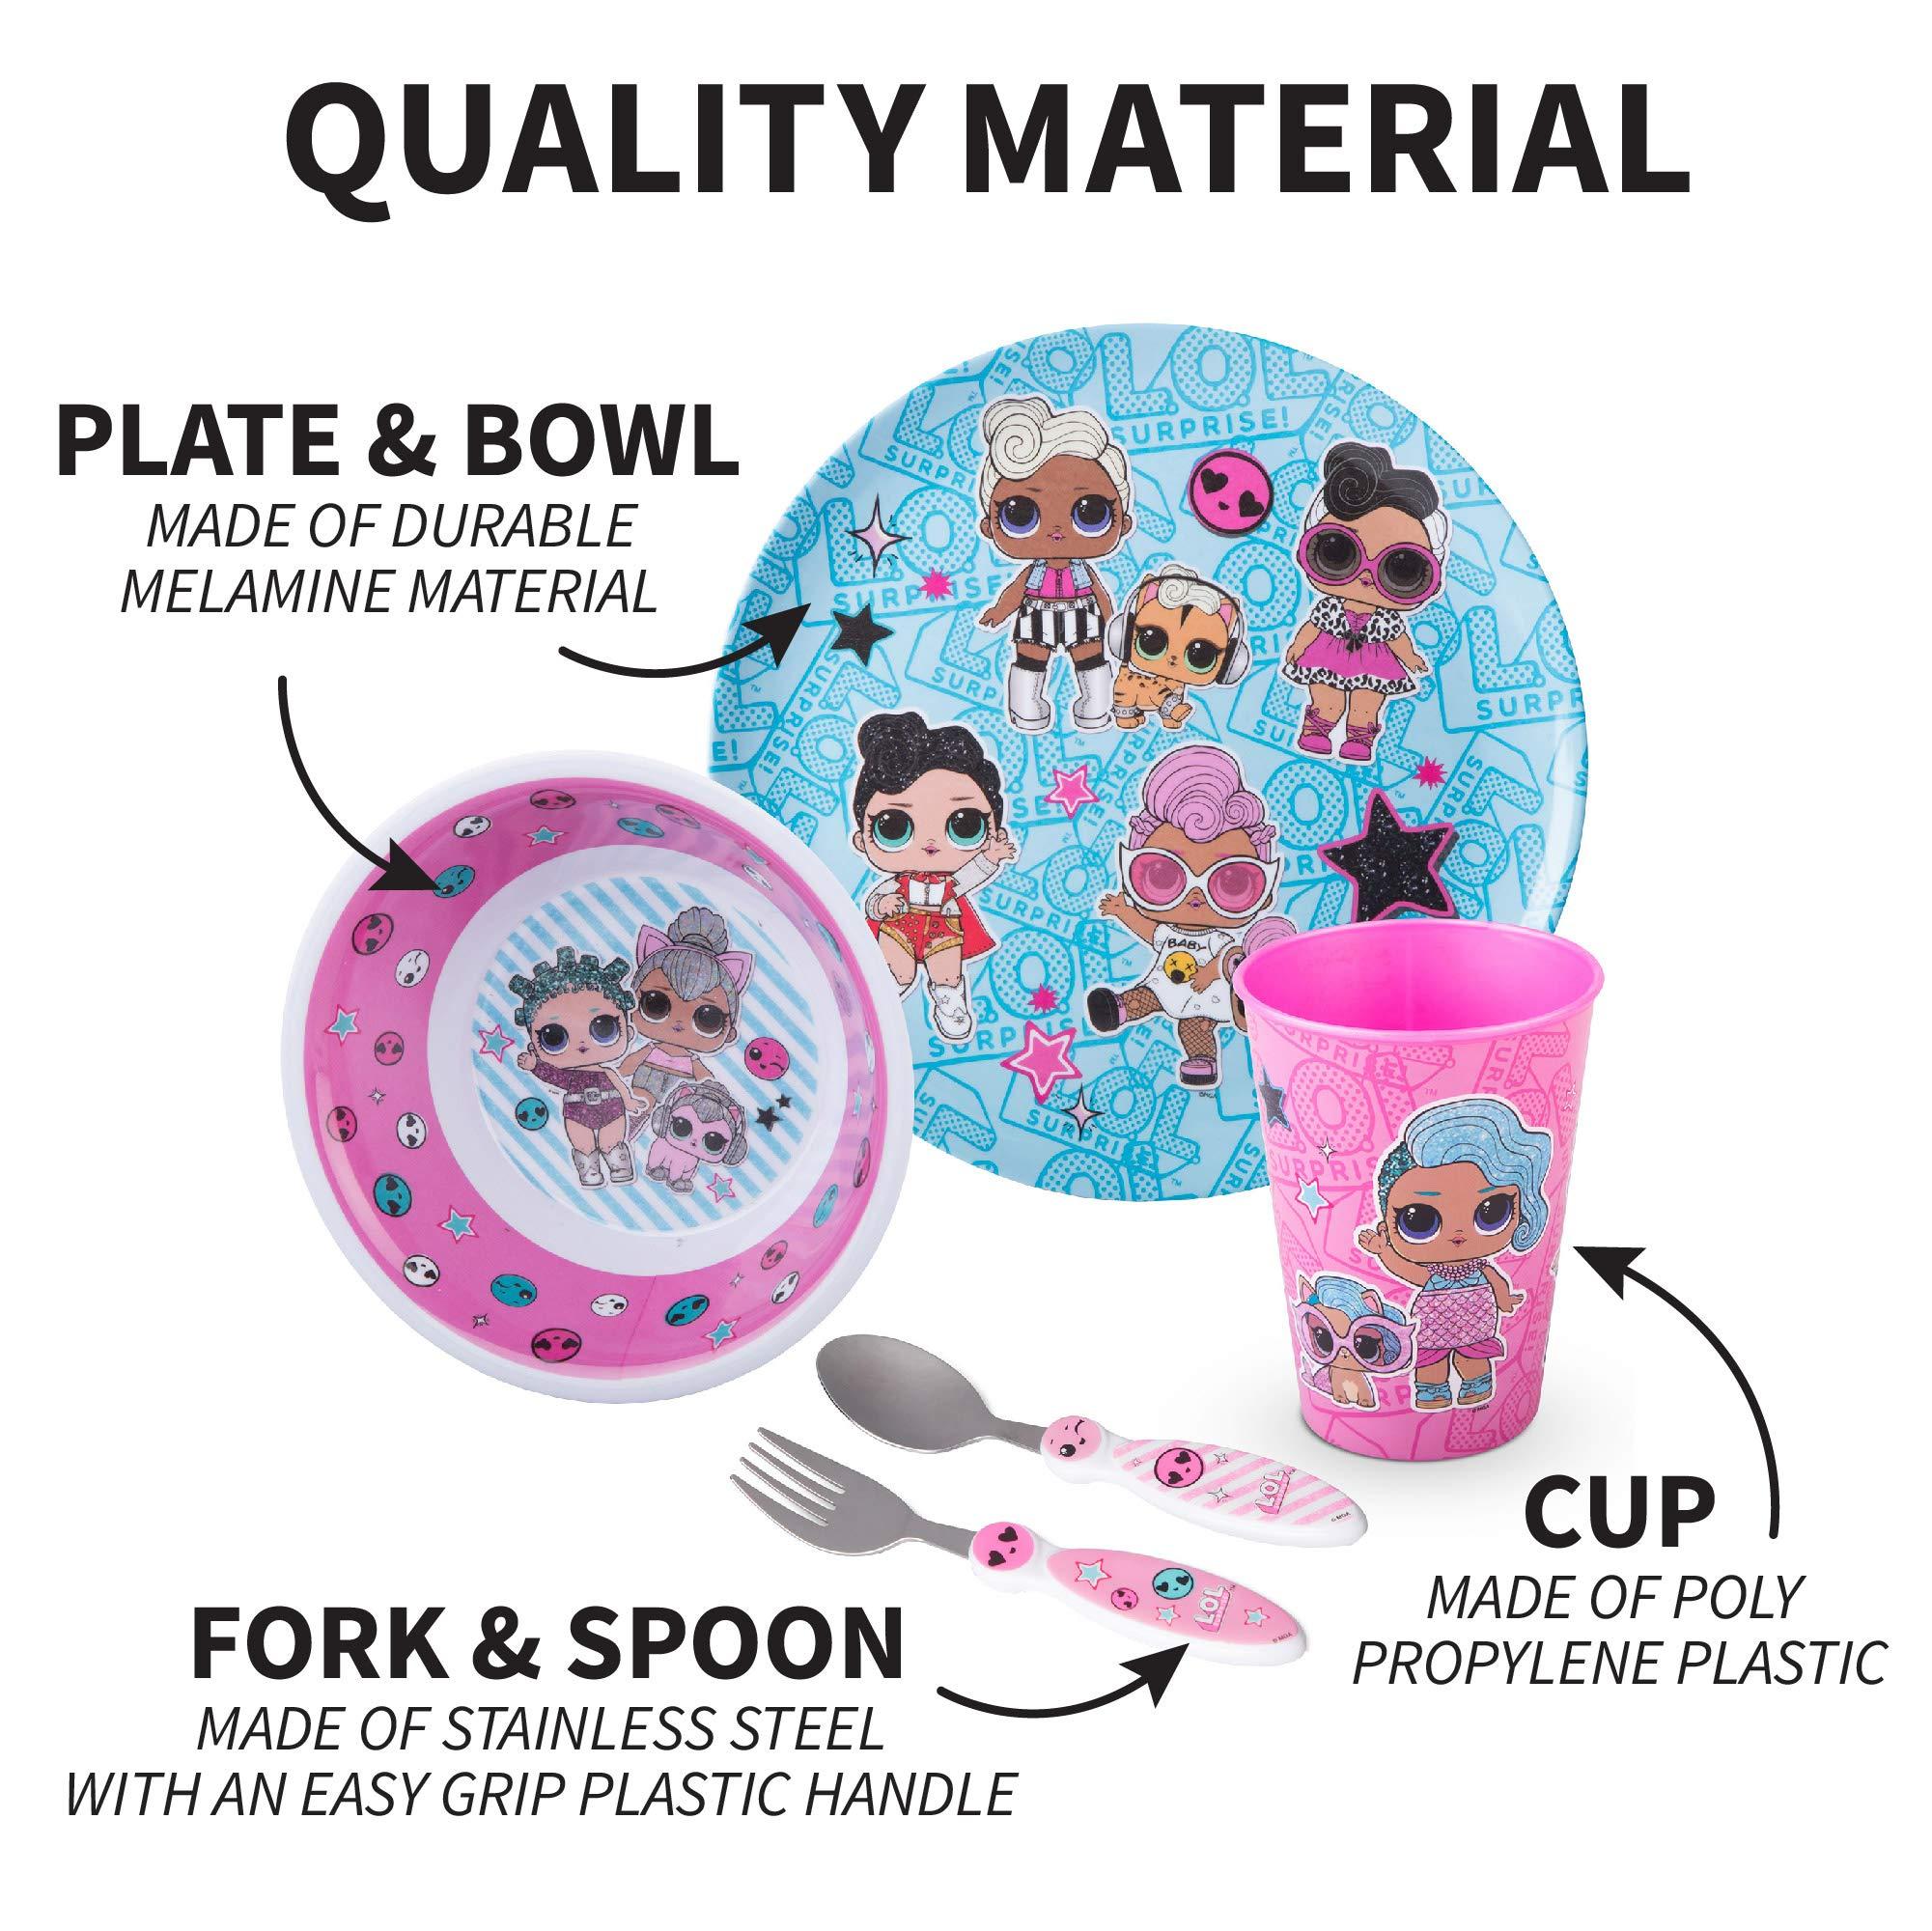 Bowl Plastic Brand New LOL Surprise Glitter It Up Breakfast Set Plate Cup